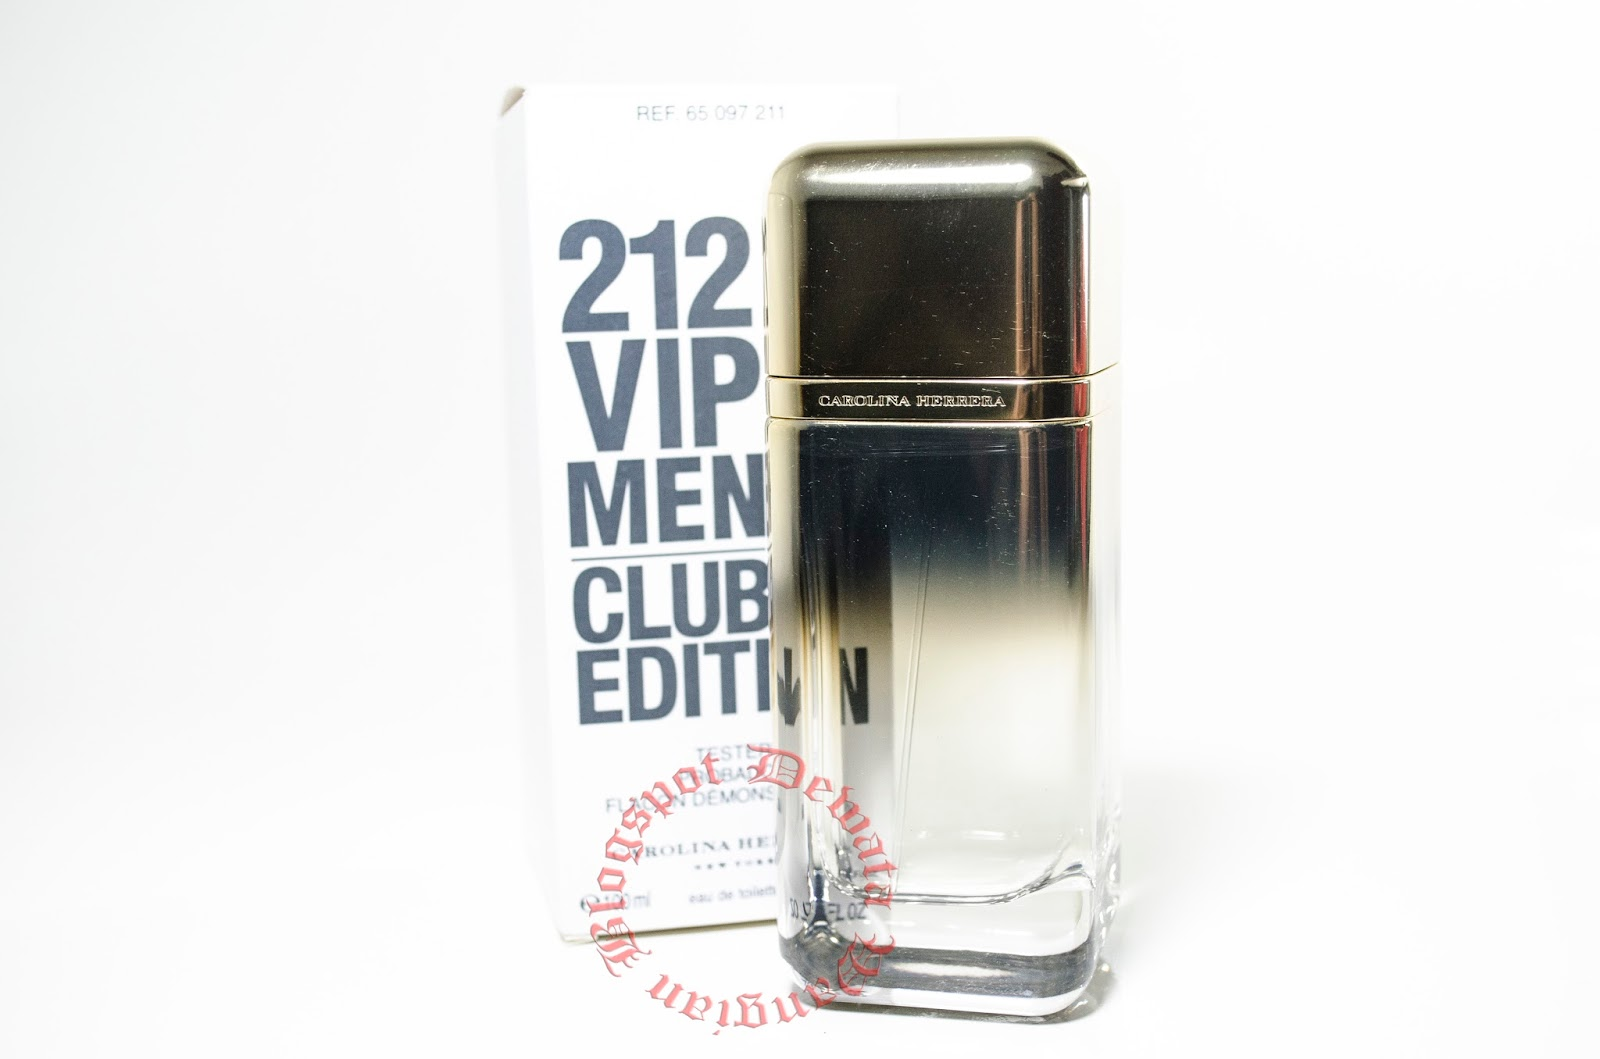 Wangianperfume Cosmetic Original Terbaik Carolina Herrera 212